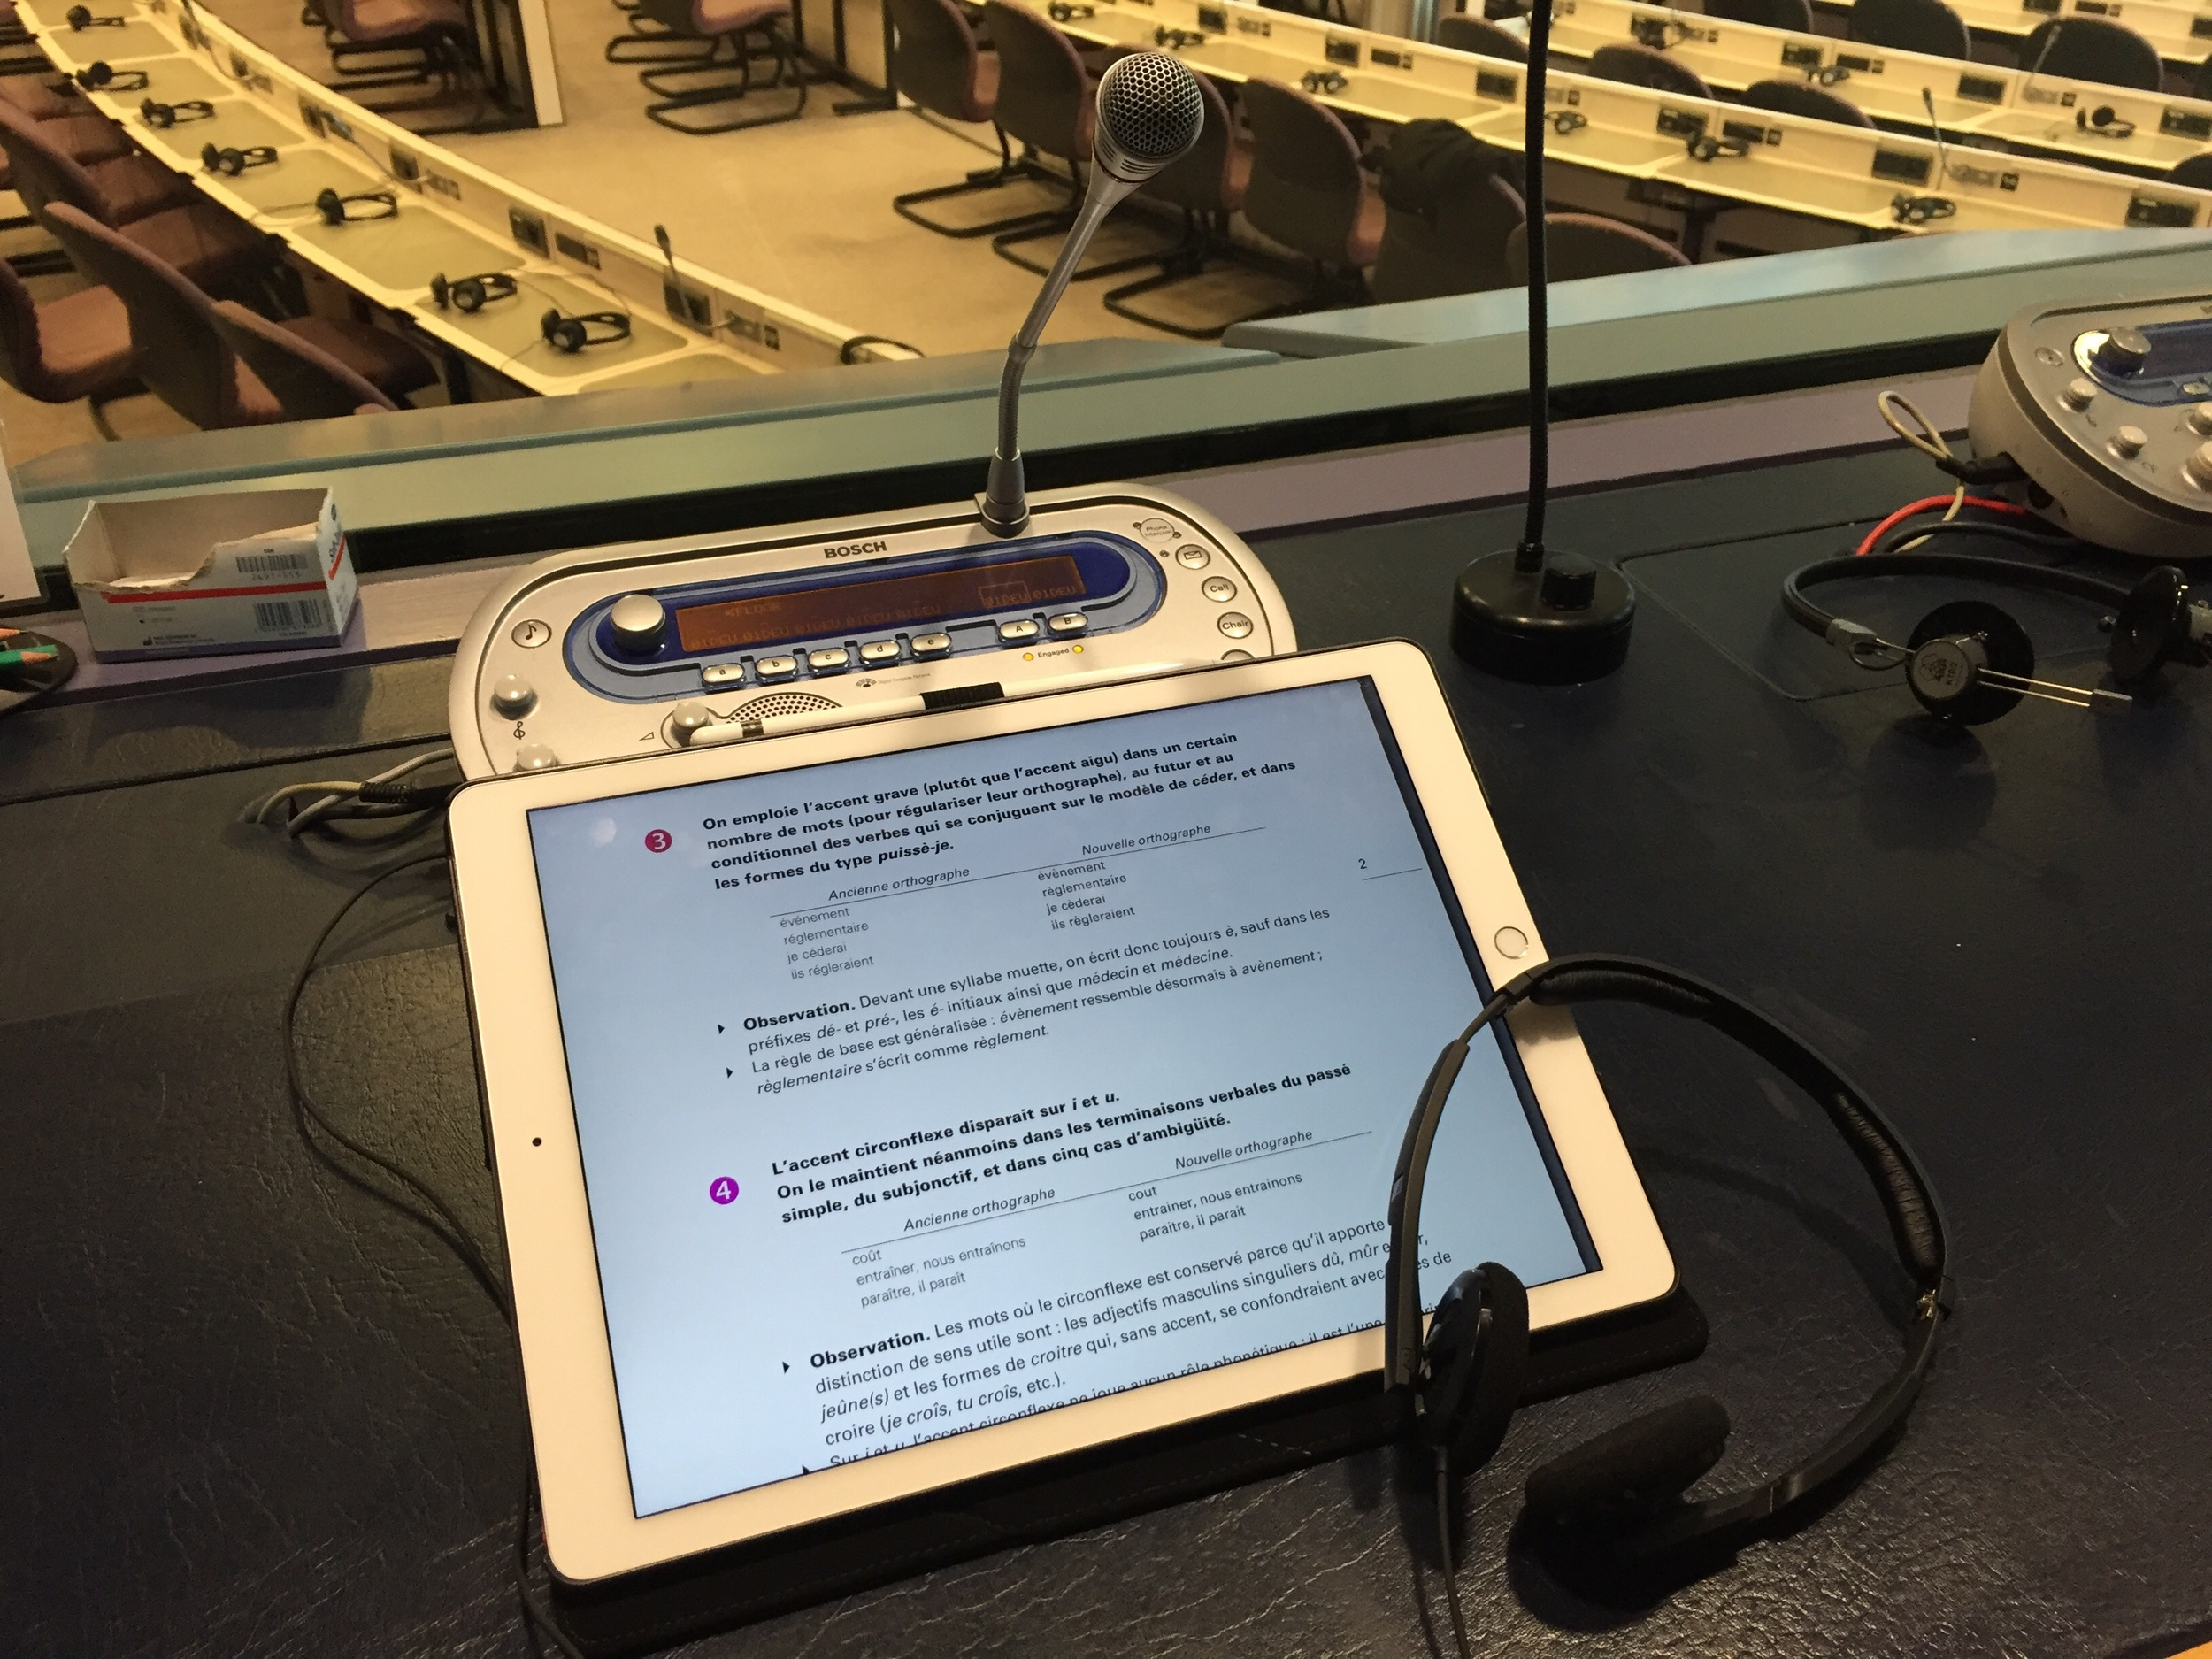 iPad Pro in an interpreting booth